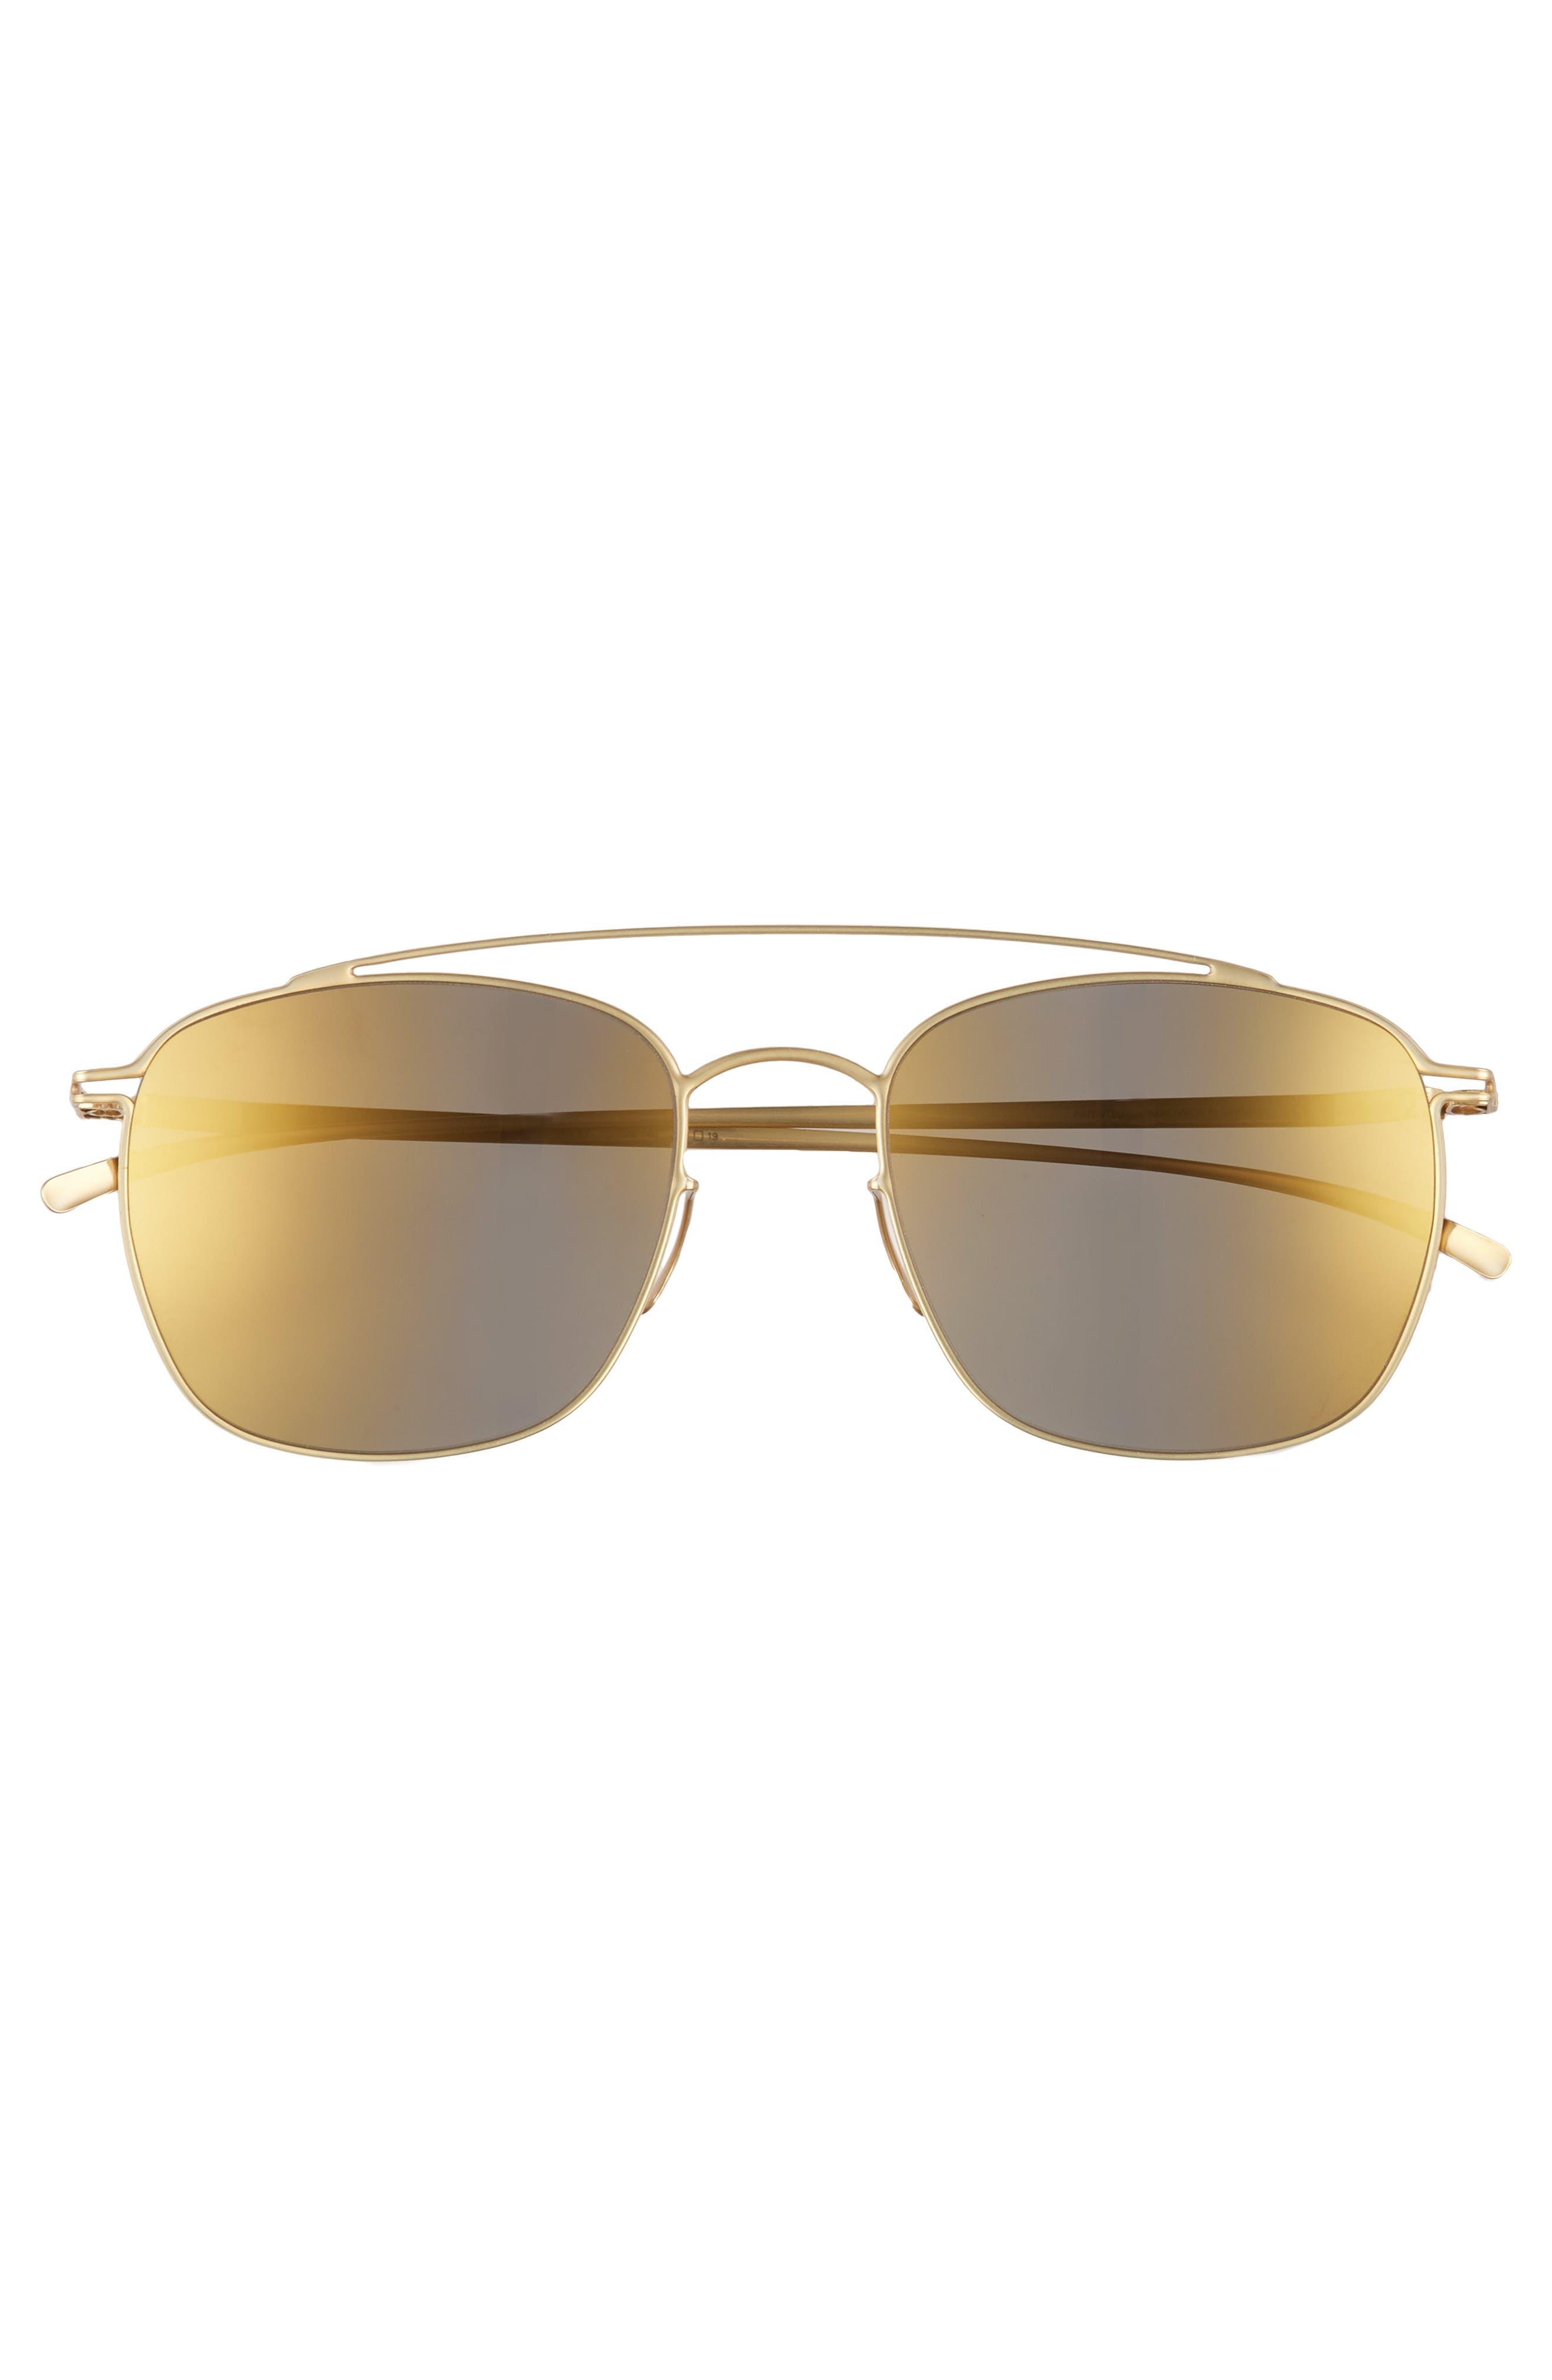 MMESSE007 51mm Aviator Sunglasses,                             Alternate thumbnail 6, color,